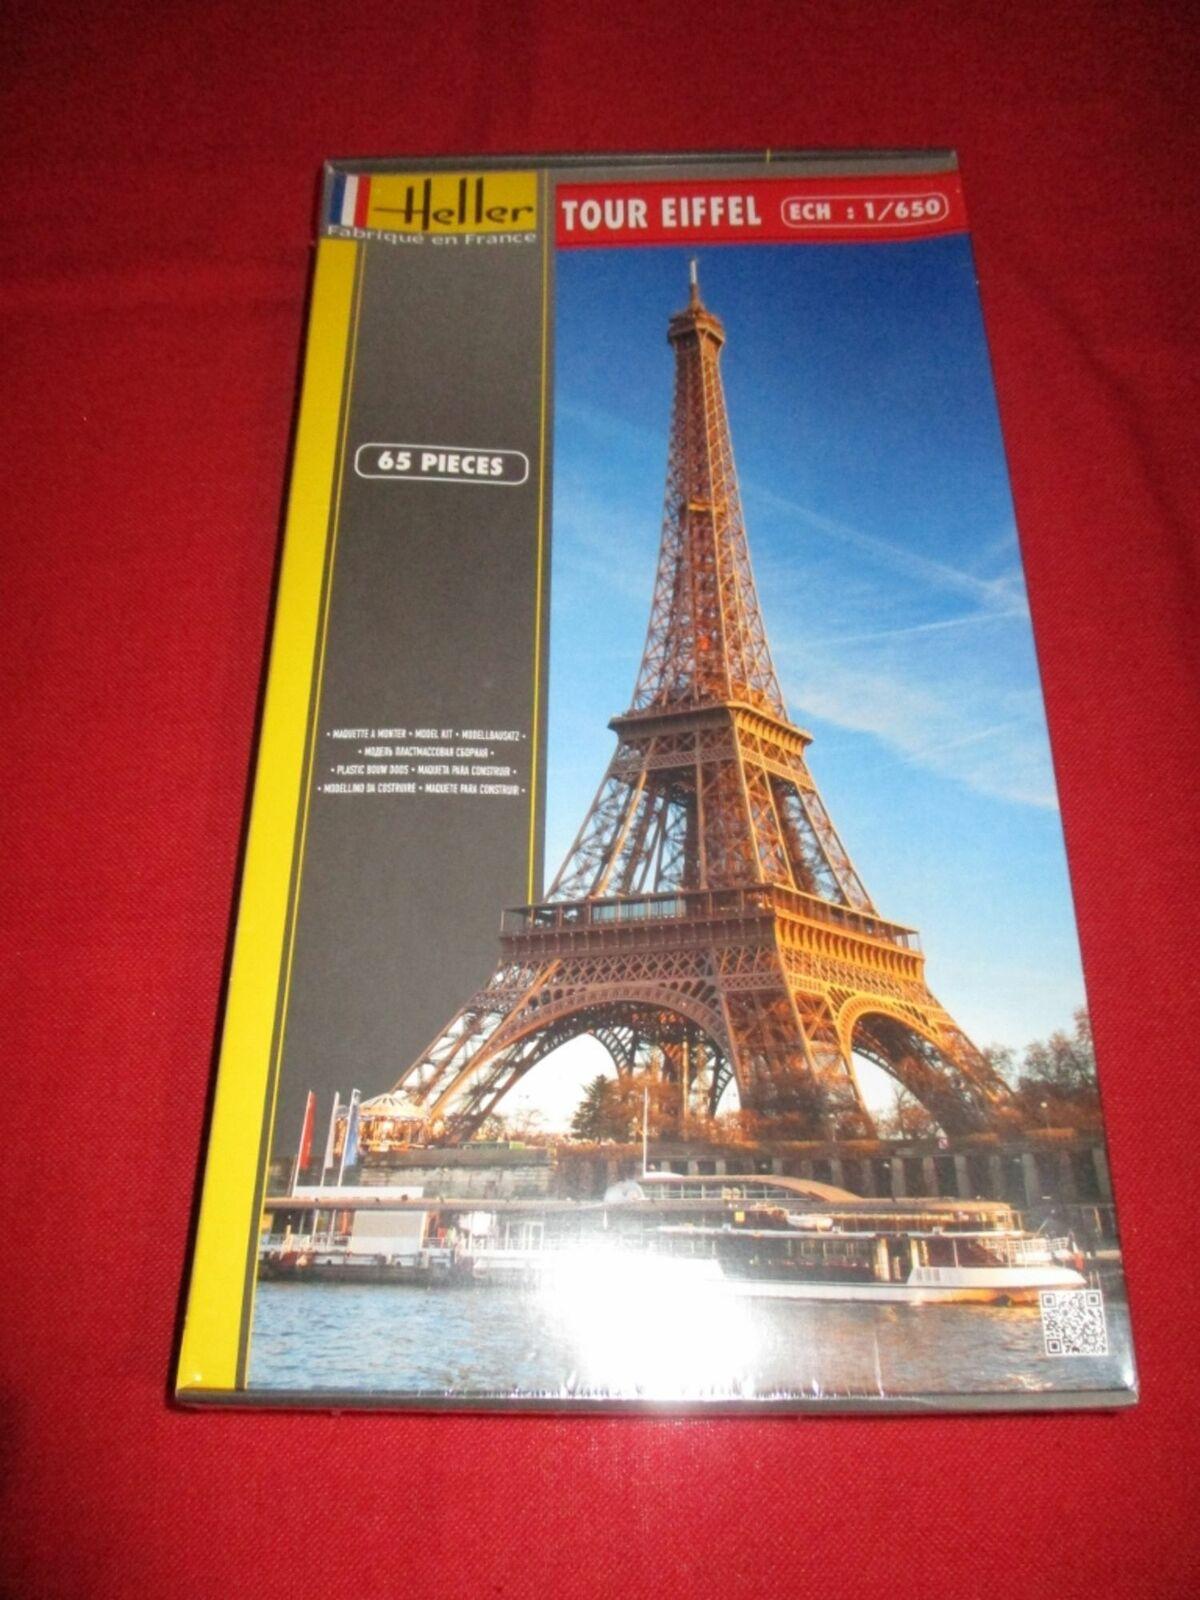 Eiffelturm Paris Modellbausatz Tour Eiffel 1:650 Model Kit Bausatz Heller 81201